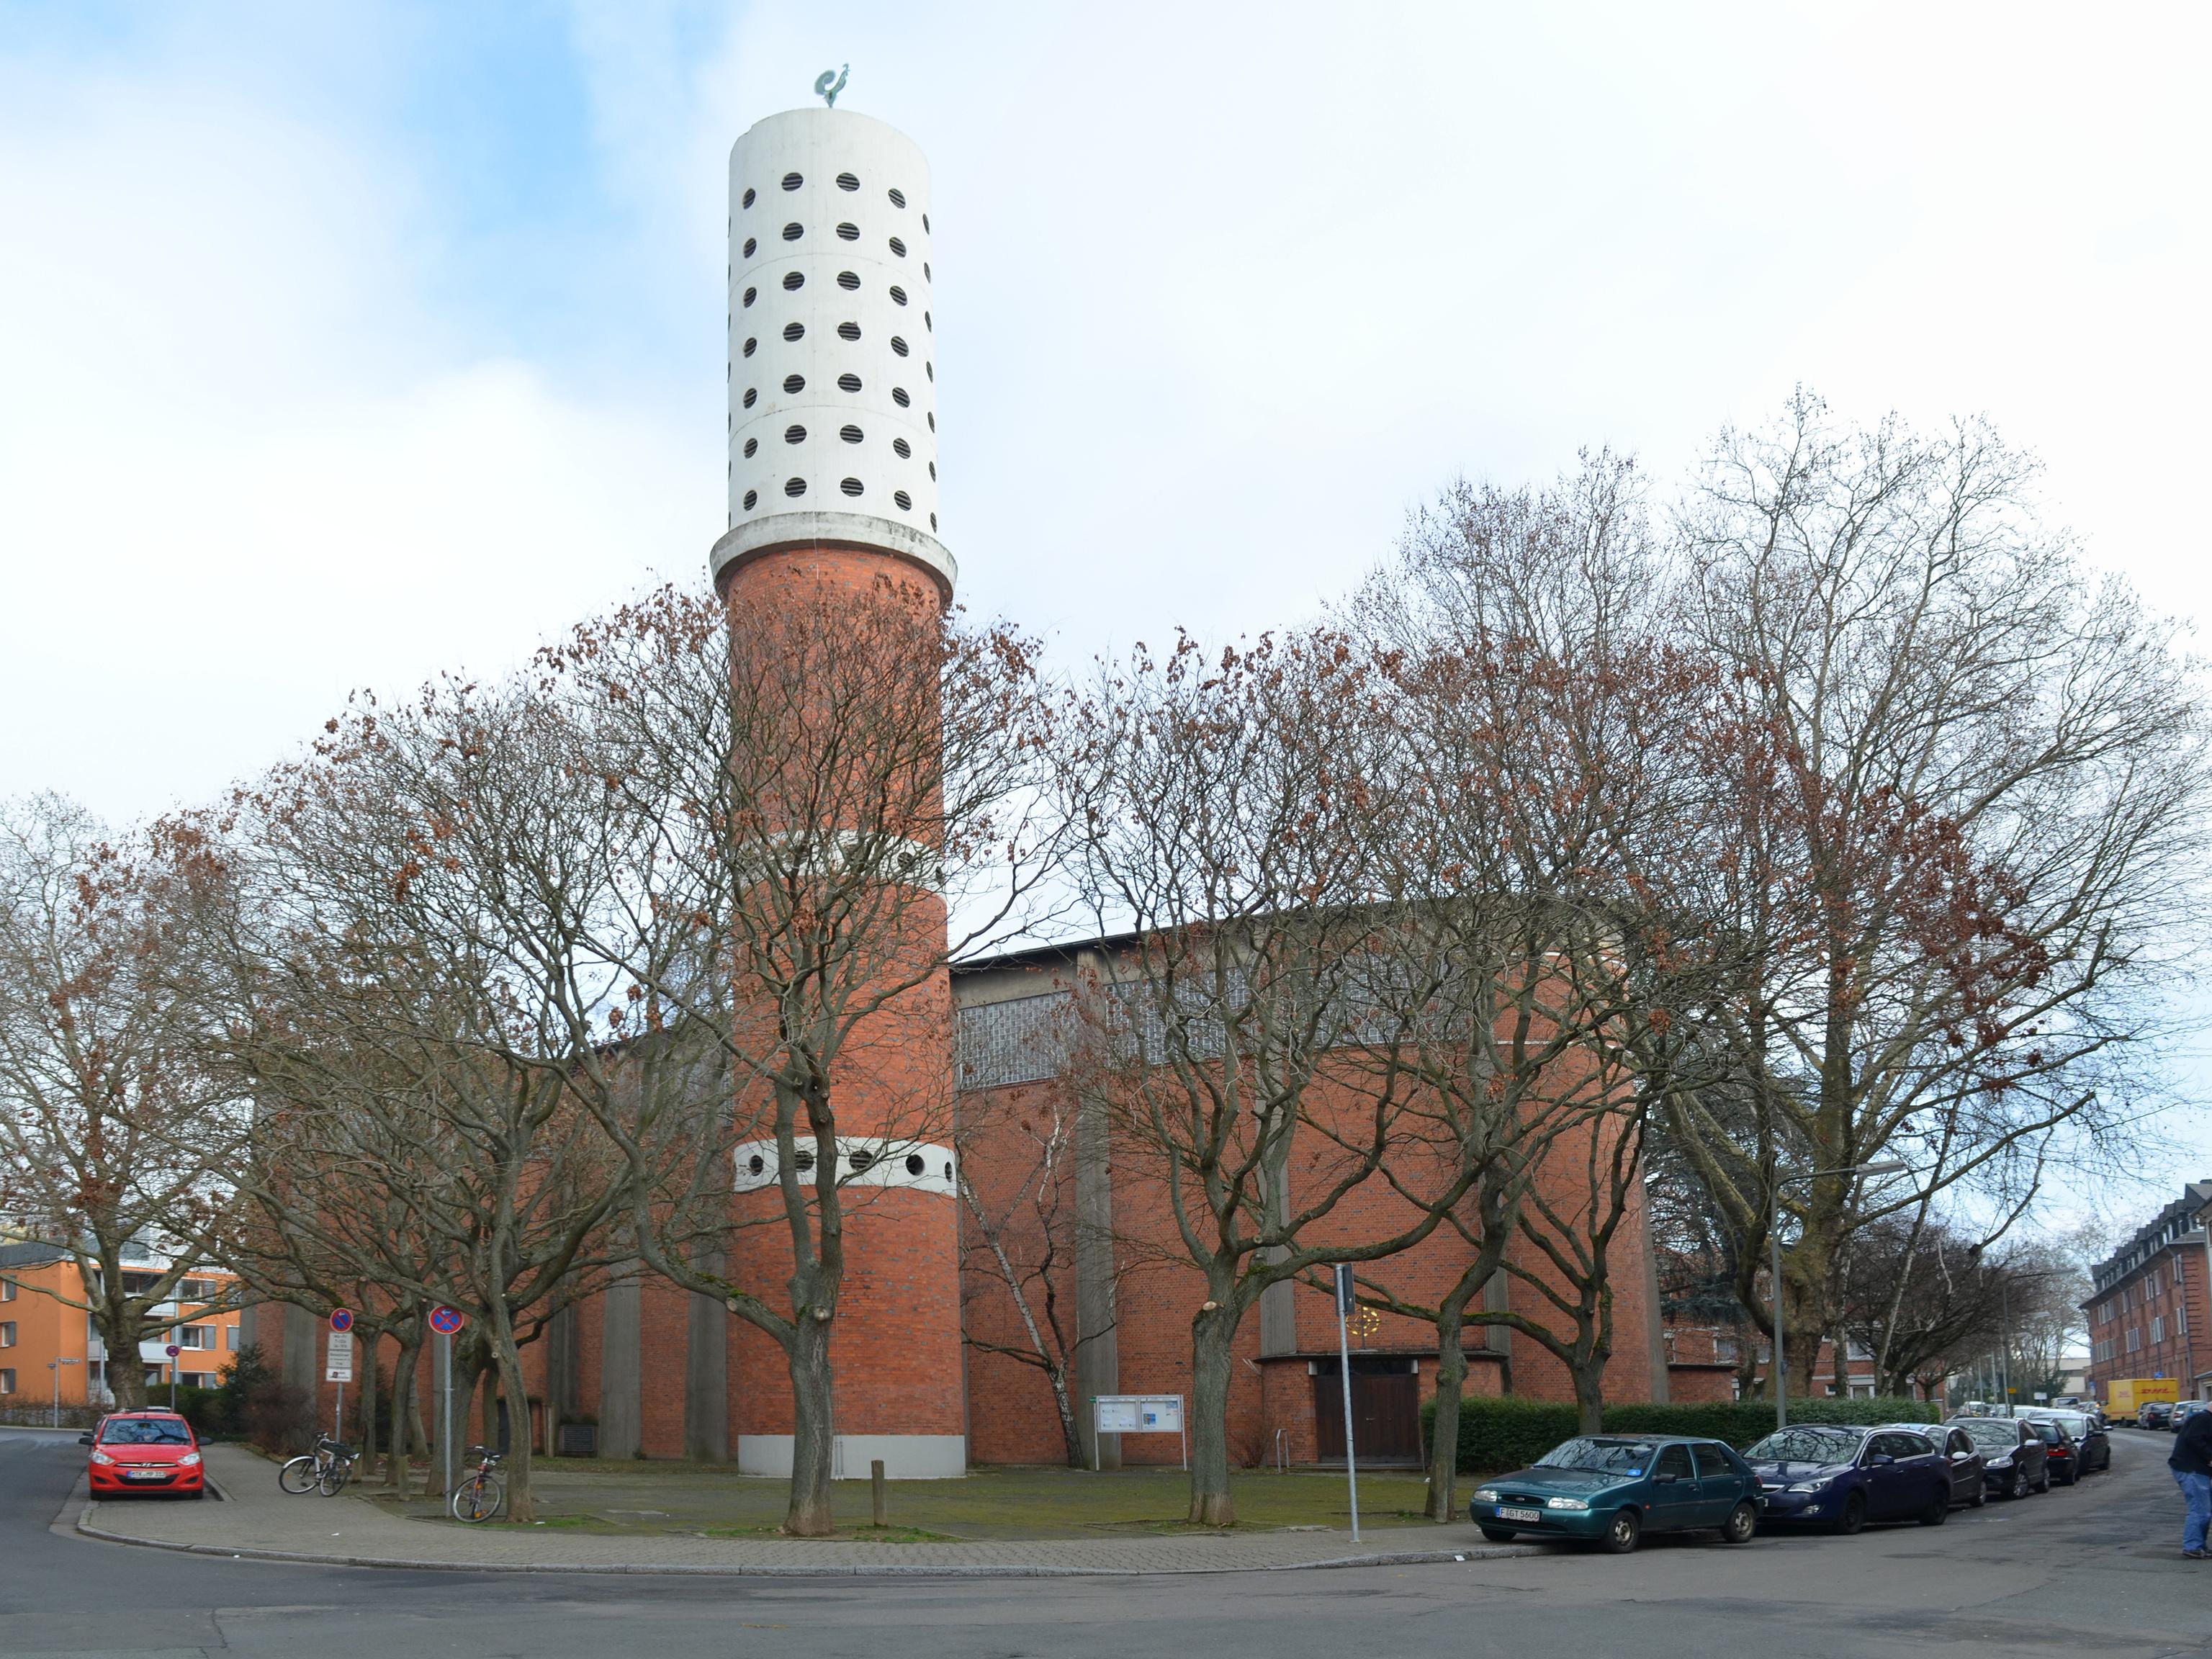 Datei:Frankfurt, Gellertstraße, St. Michaels-Kirche cropped.jpg ...